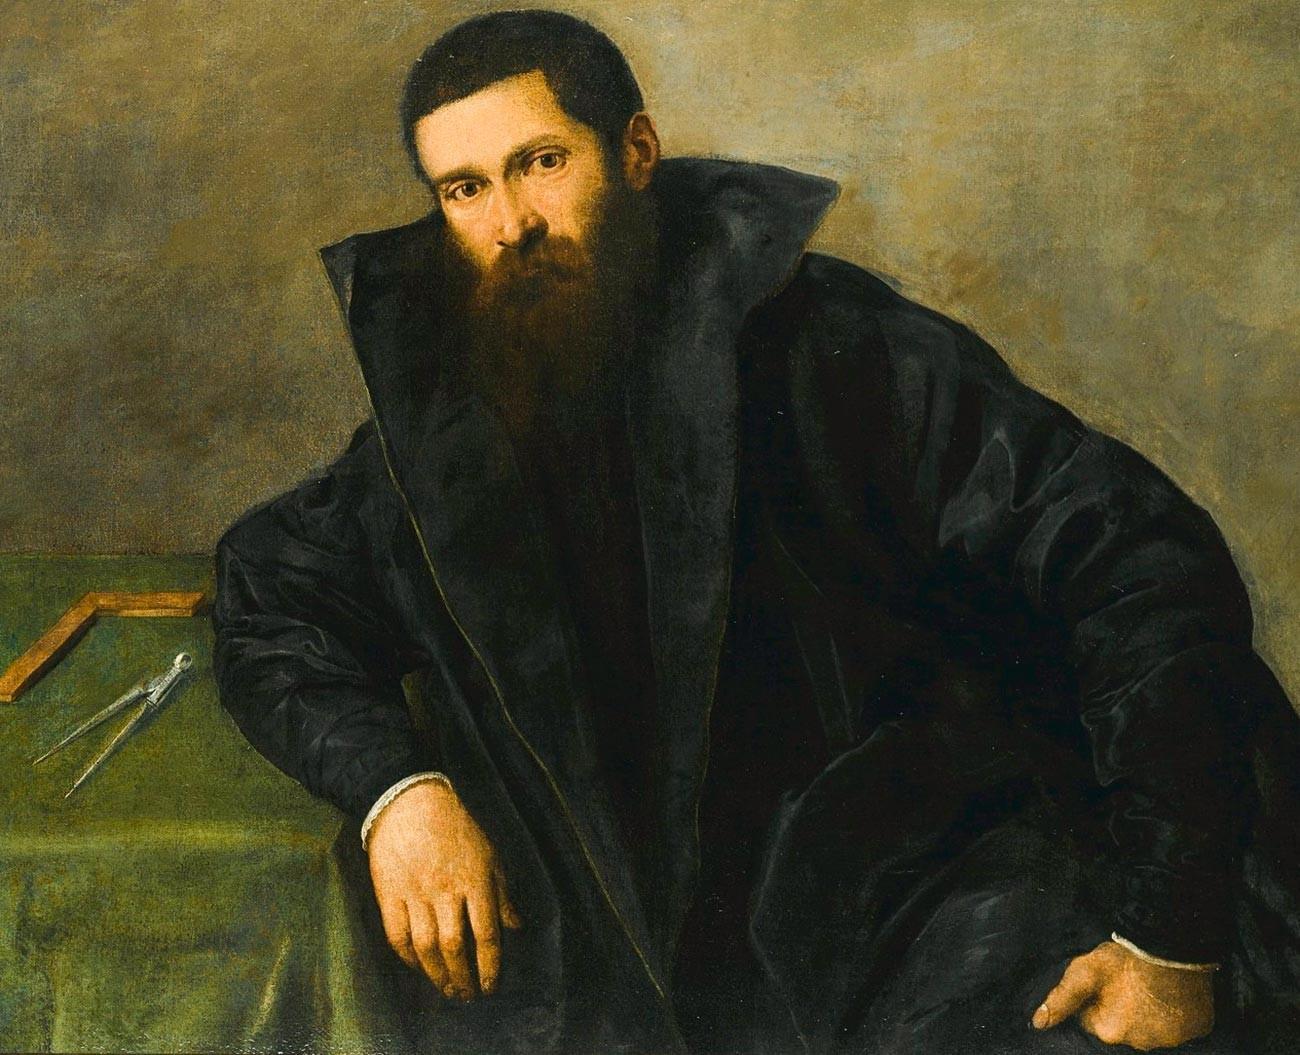 Aristotle Fioravanti